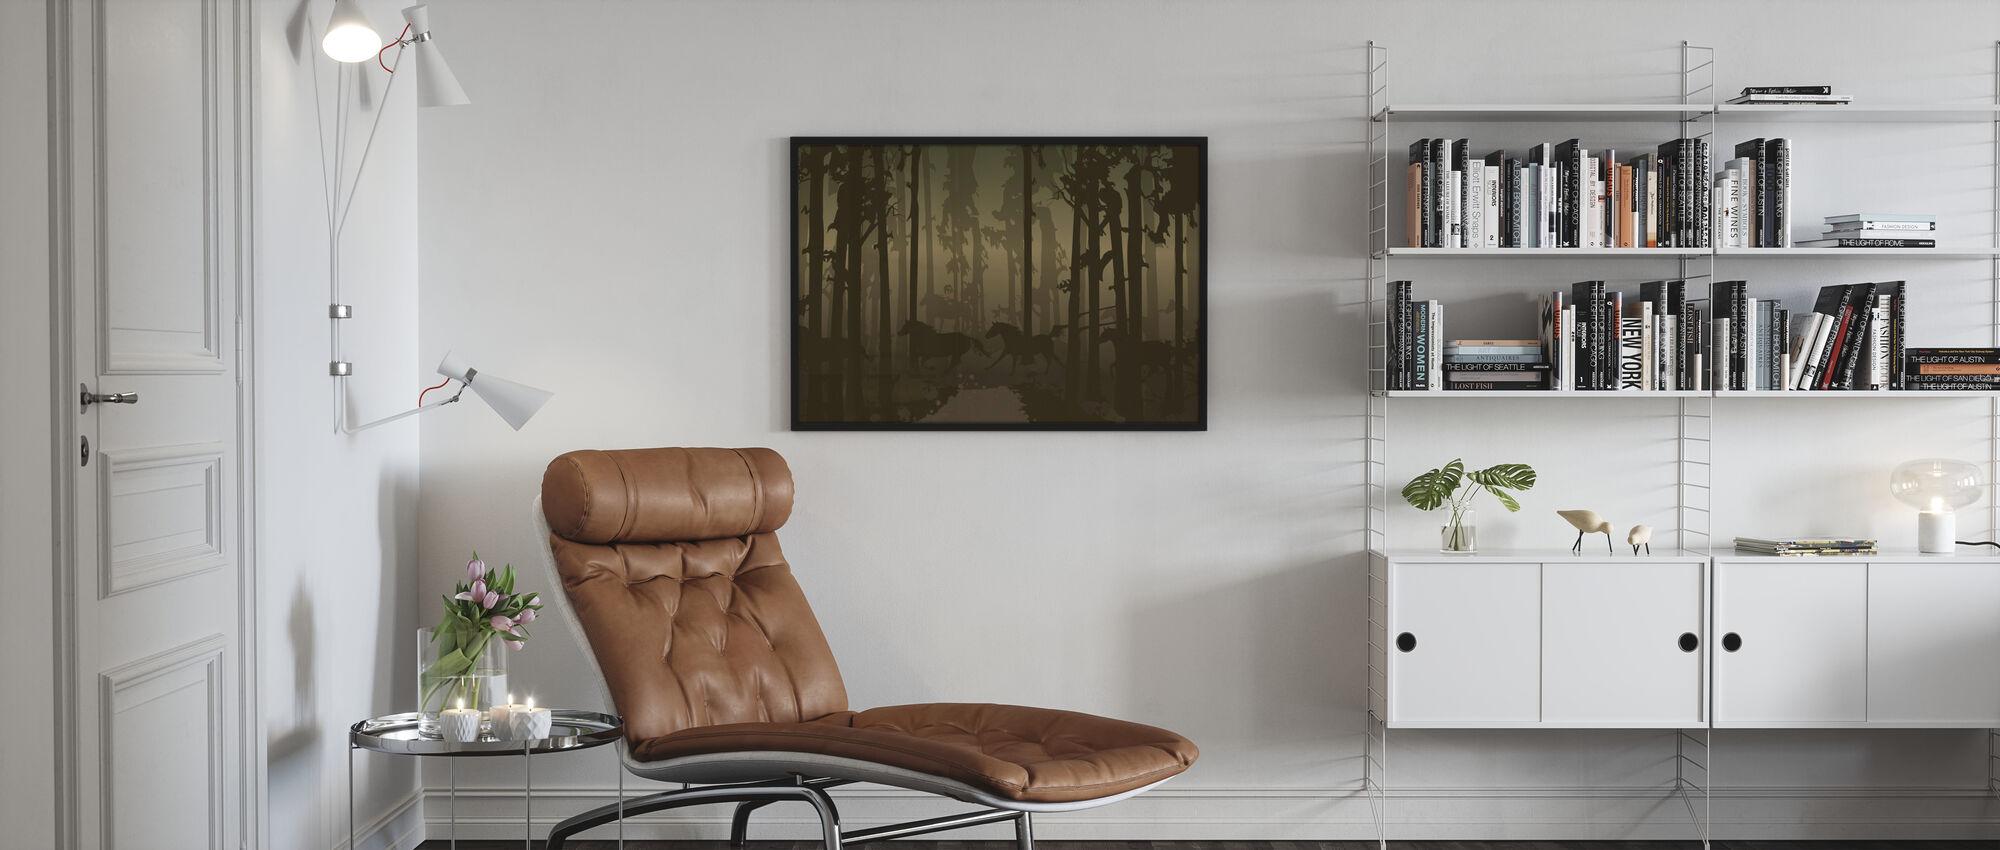 Nieuw Bos - Poster - Woonkamer